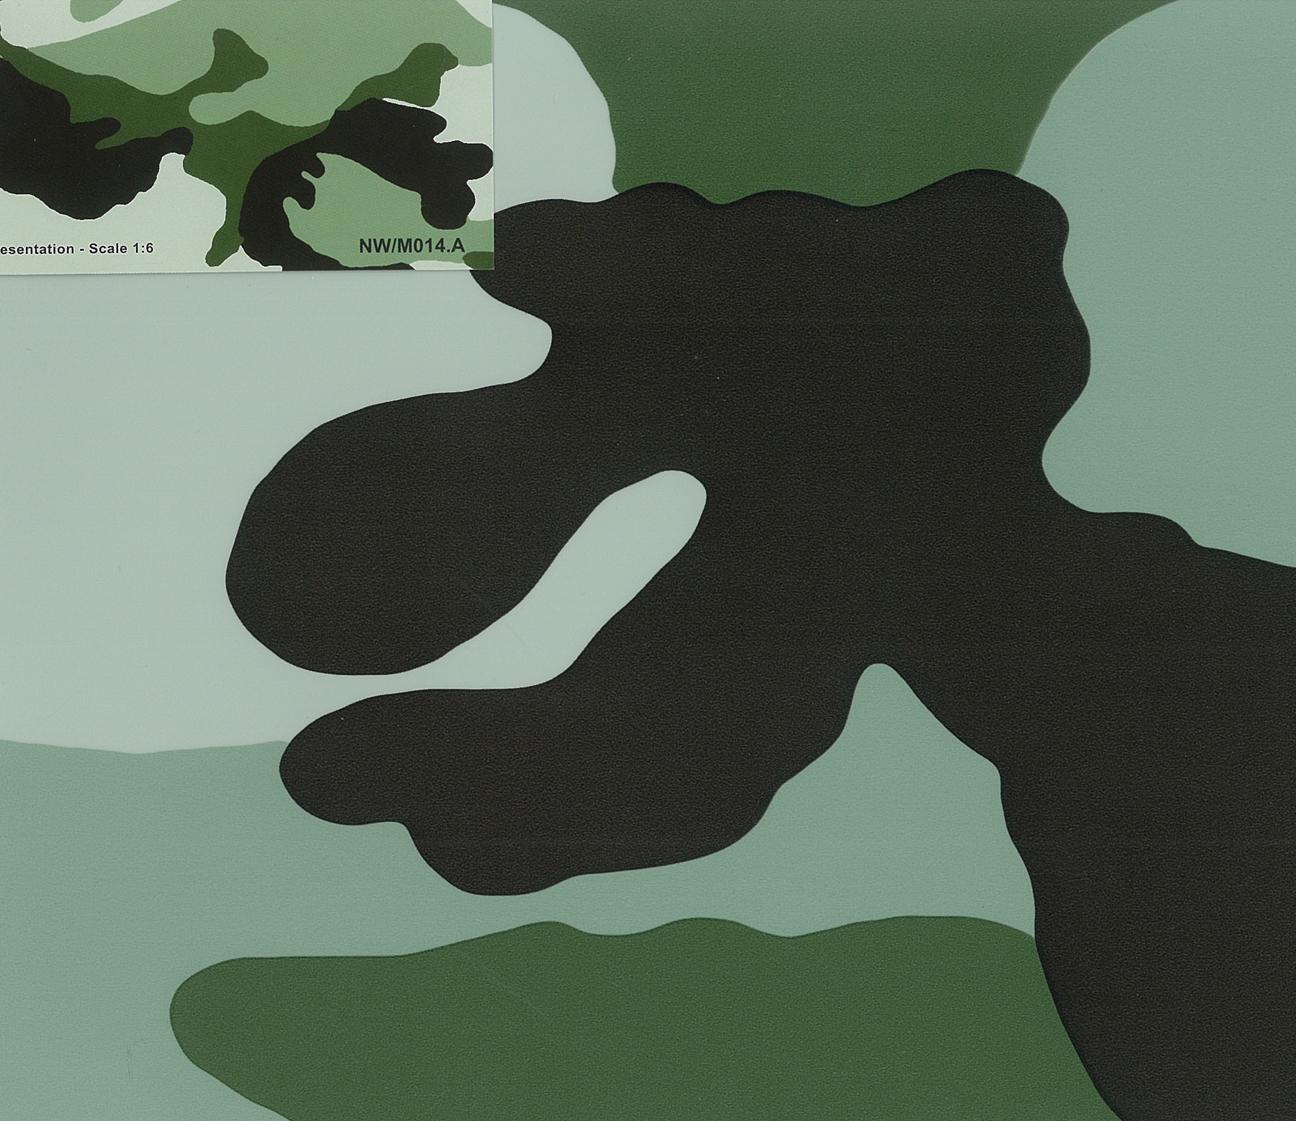 4 d camouflage tarnfarben im armeelook klebefolien for Klebefolie billig